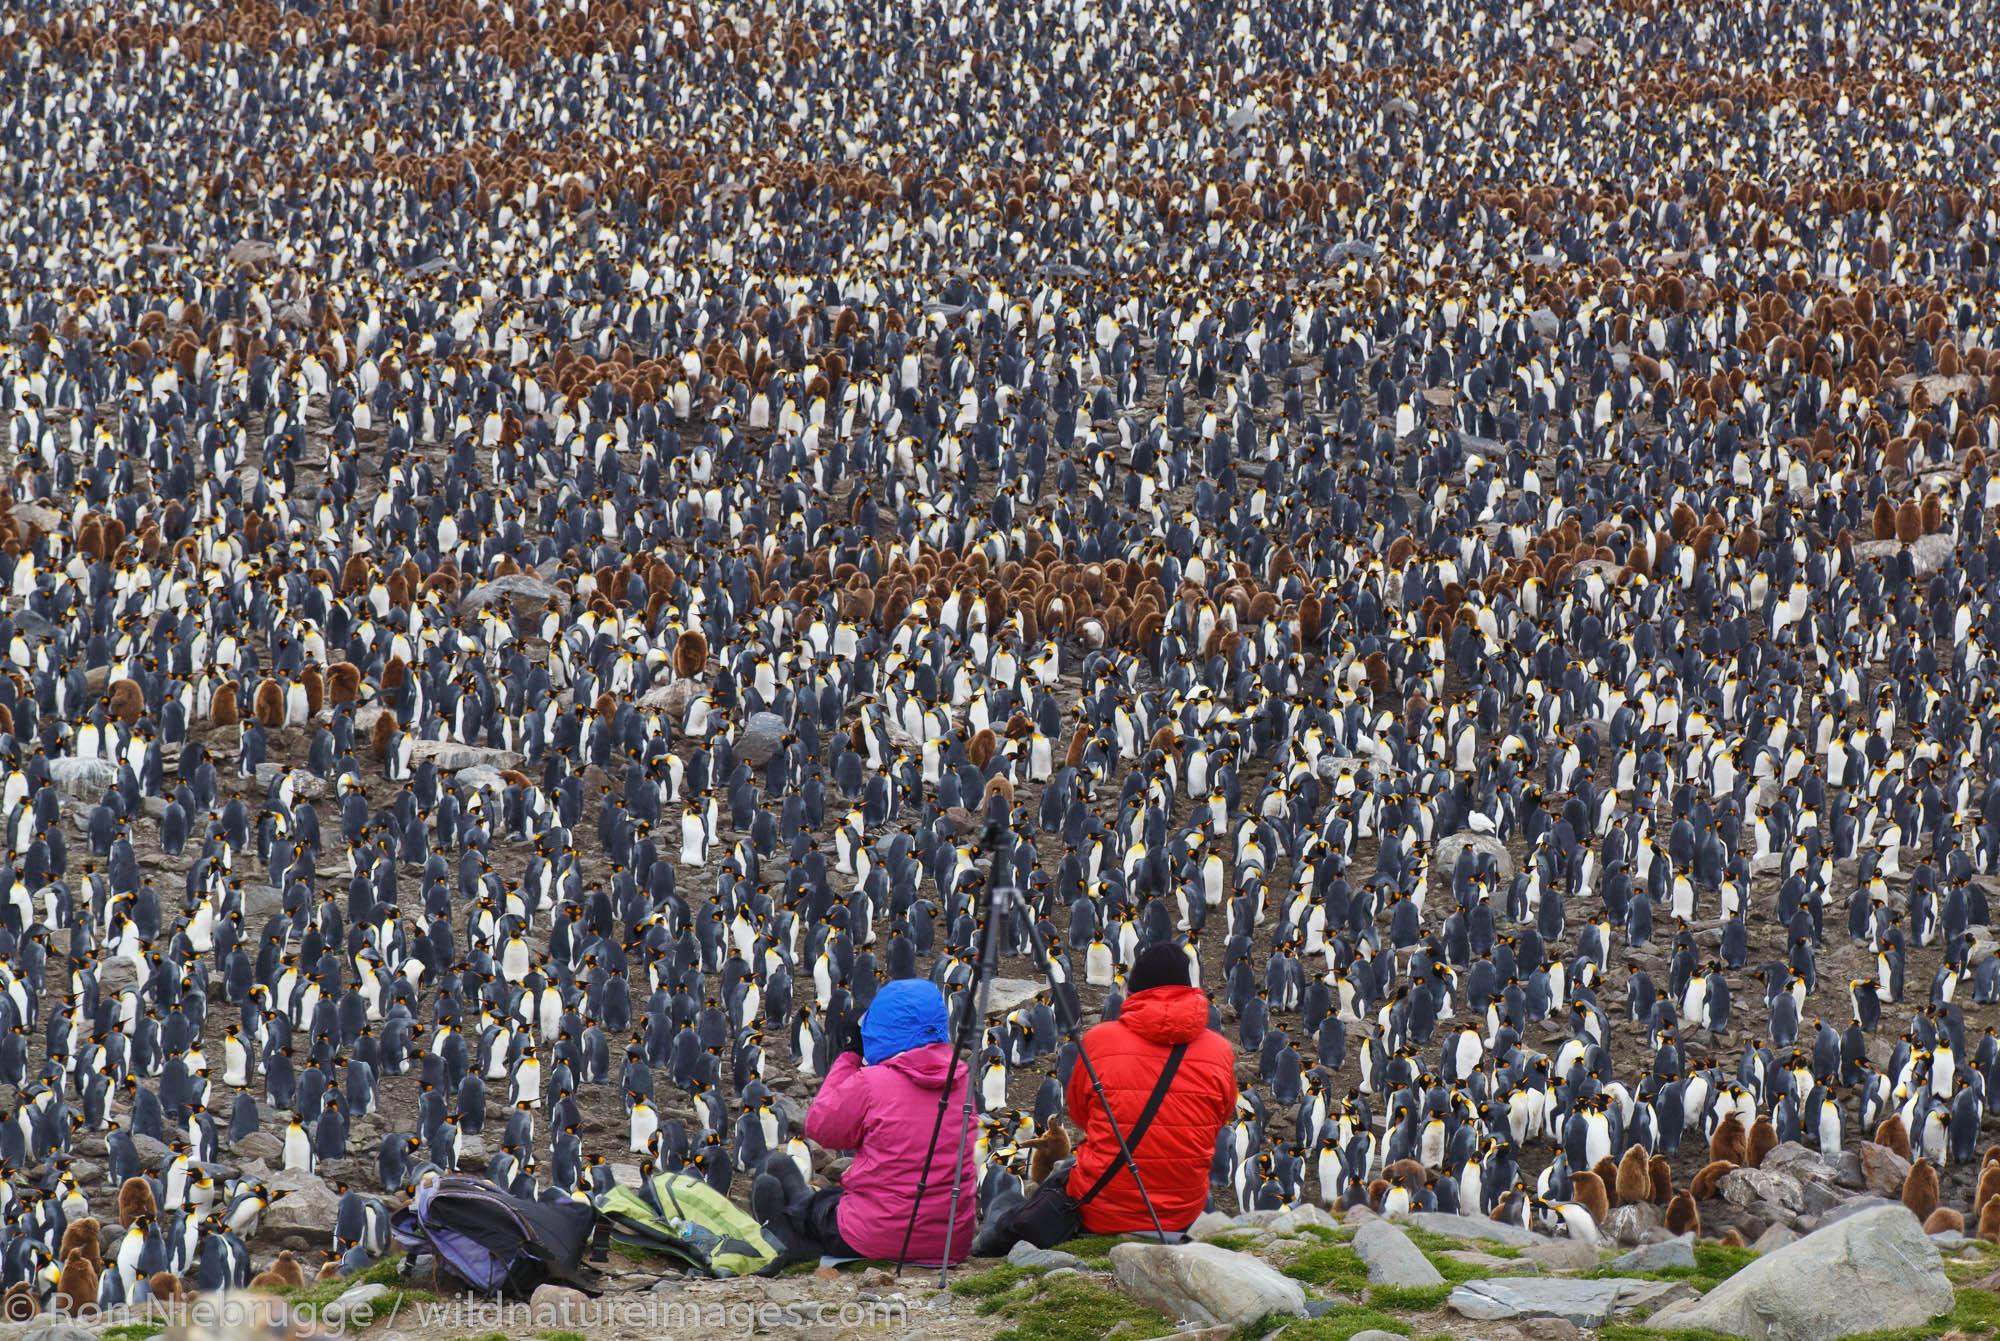 Visitors at a King penguin colony (Aptenodytes patagonicus), Saint Andrews Bay, South Georgia, Antarctica.